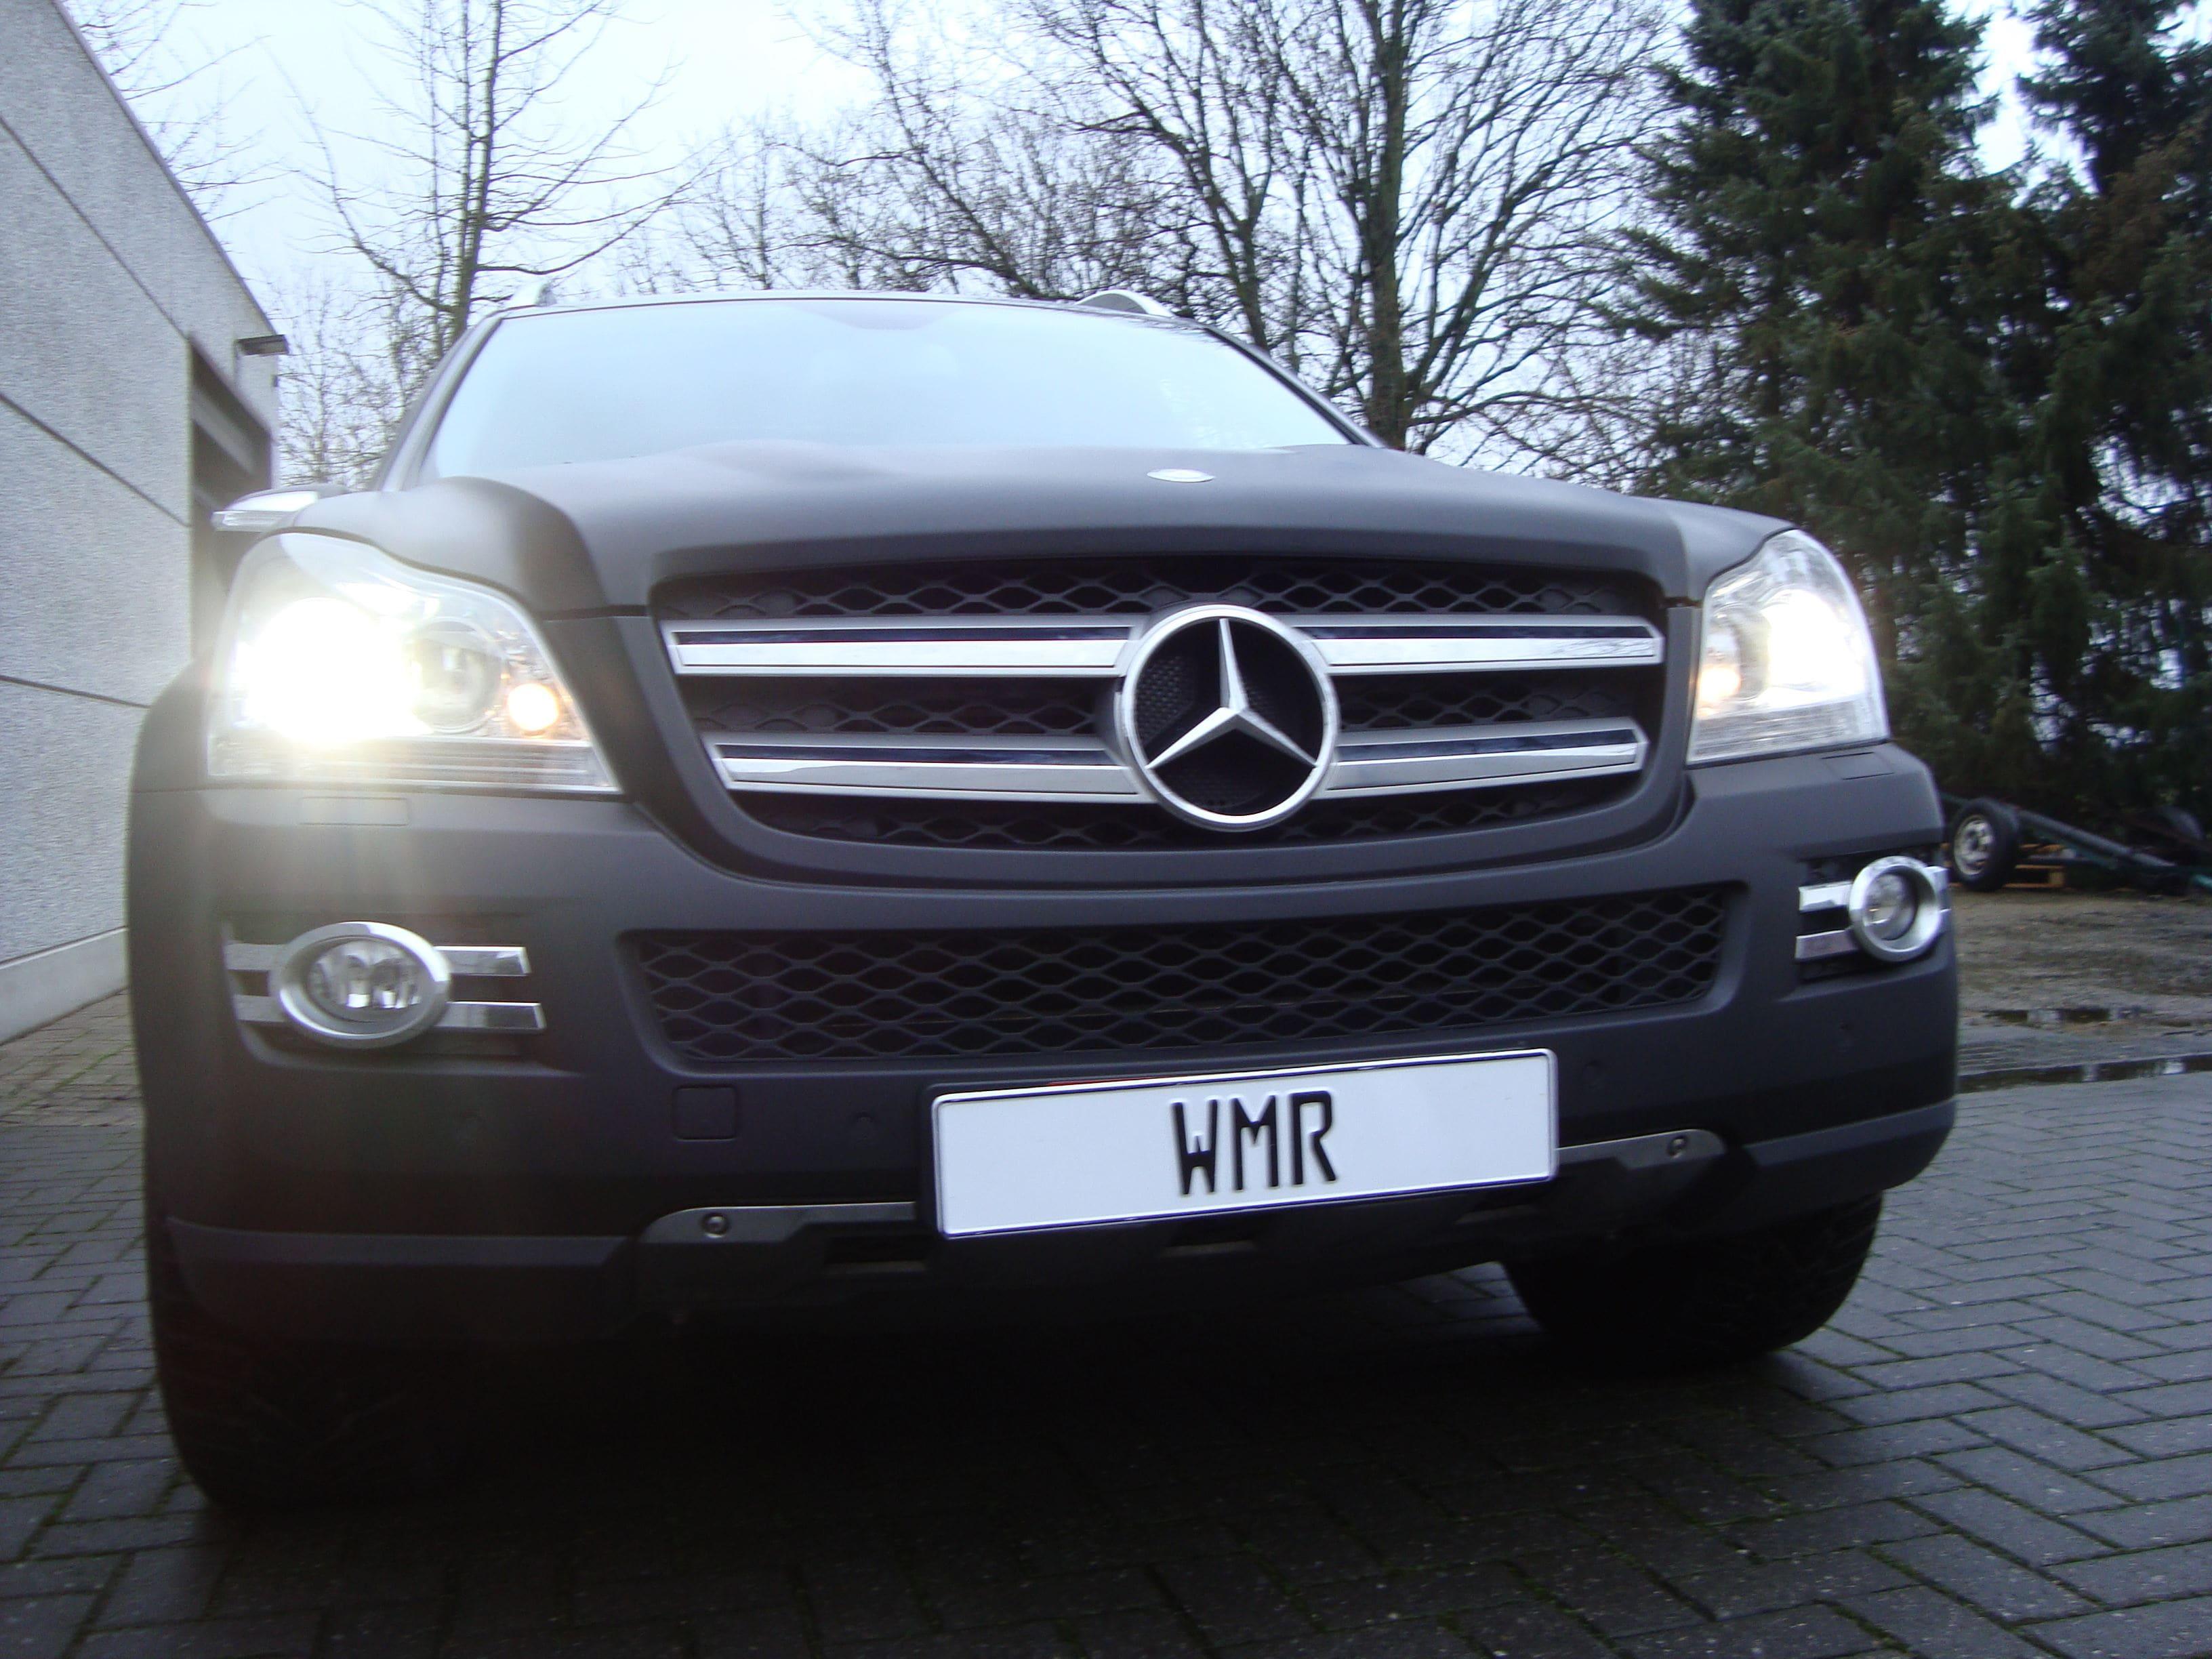 Mercedes GL met Mat Zwarte Wrap, Carwrapping door Wrapmyride.nu Foto-nr:6287, ©2020